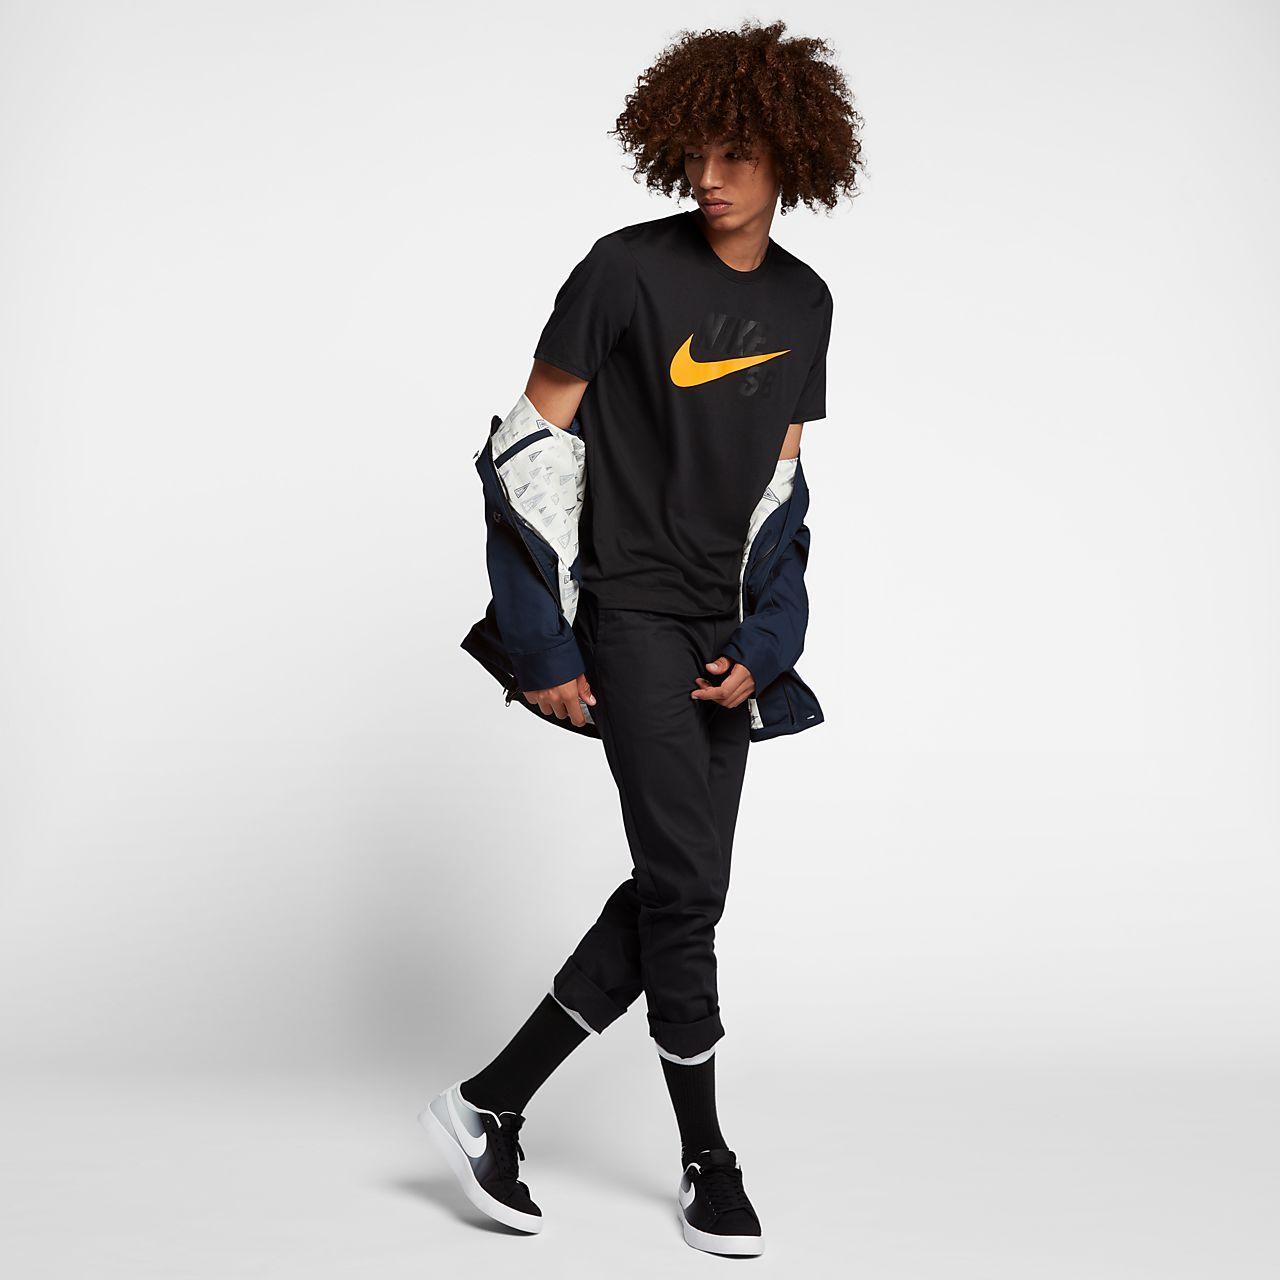 afba6b3a4c Discover ideas about Coach Men. Nike SB Flex Coaches Men s Jacket